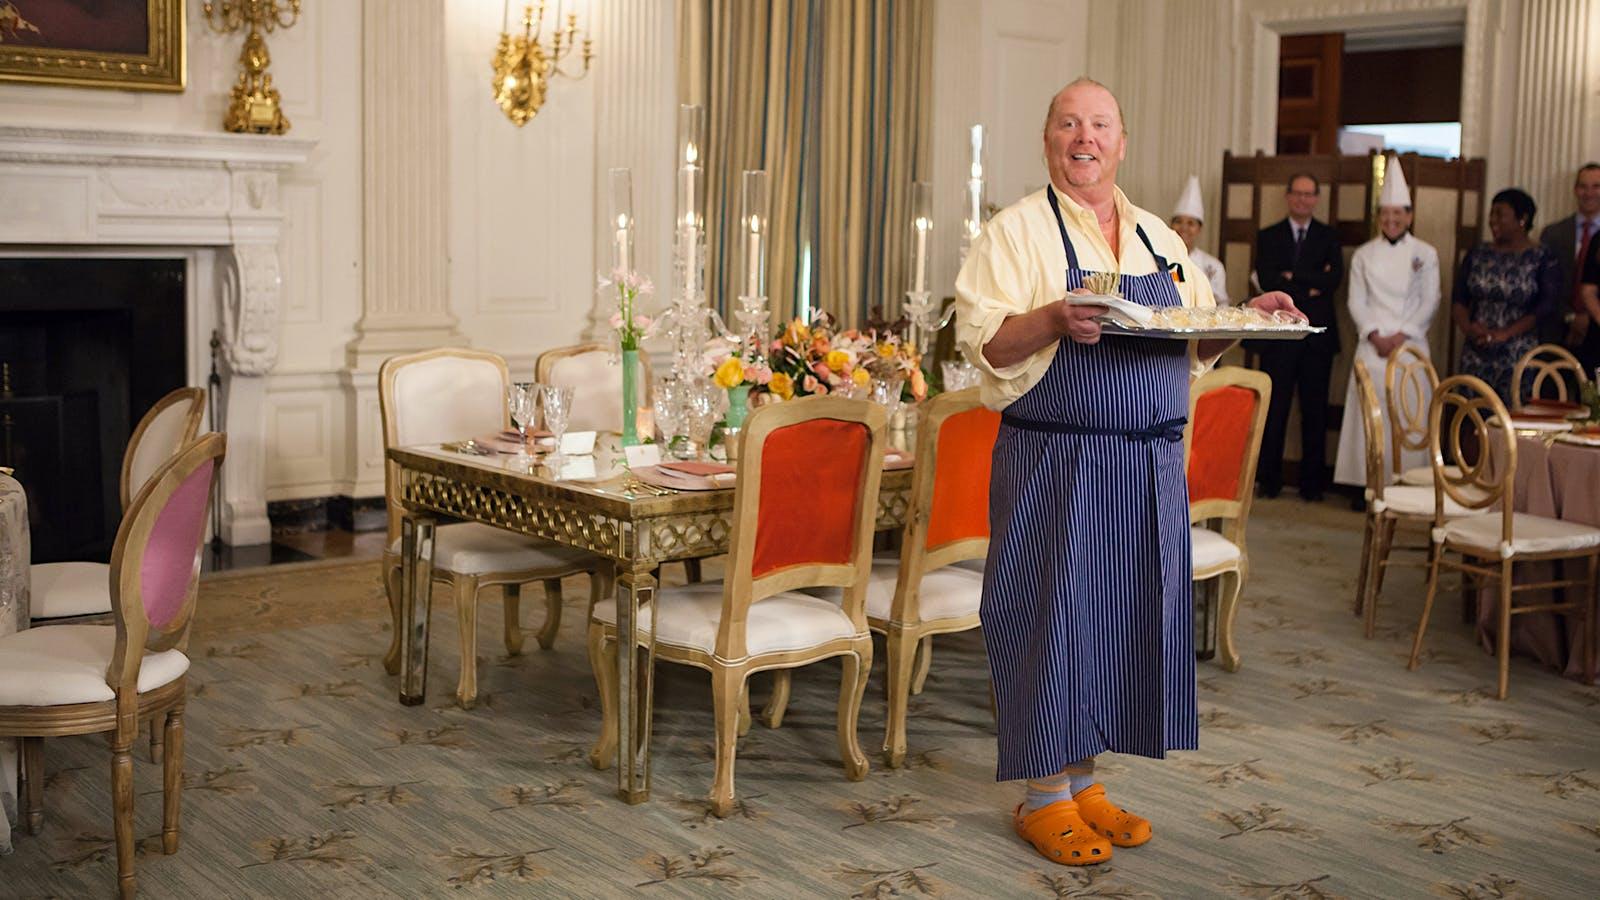 Mario Batali in the White House Kitchen